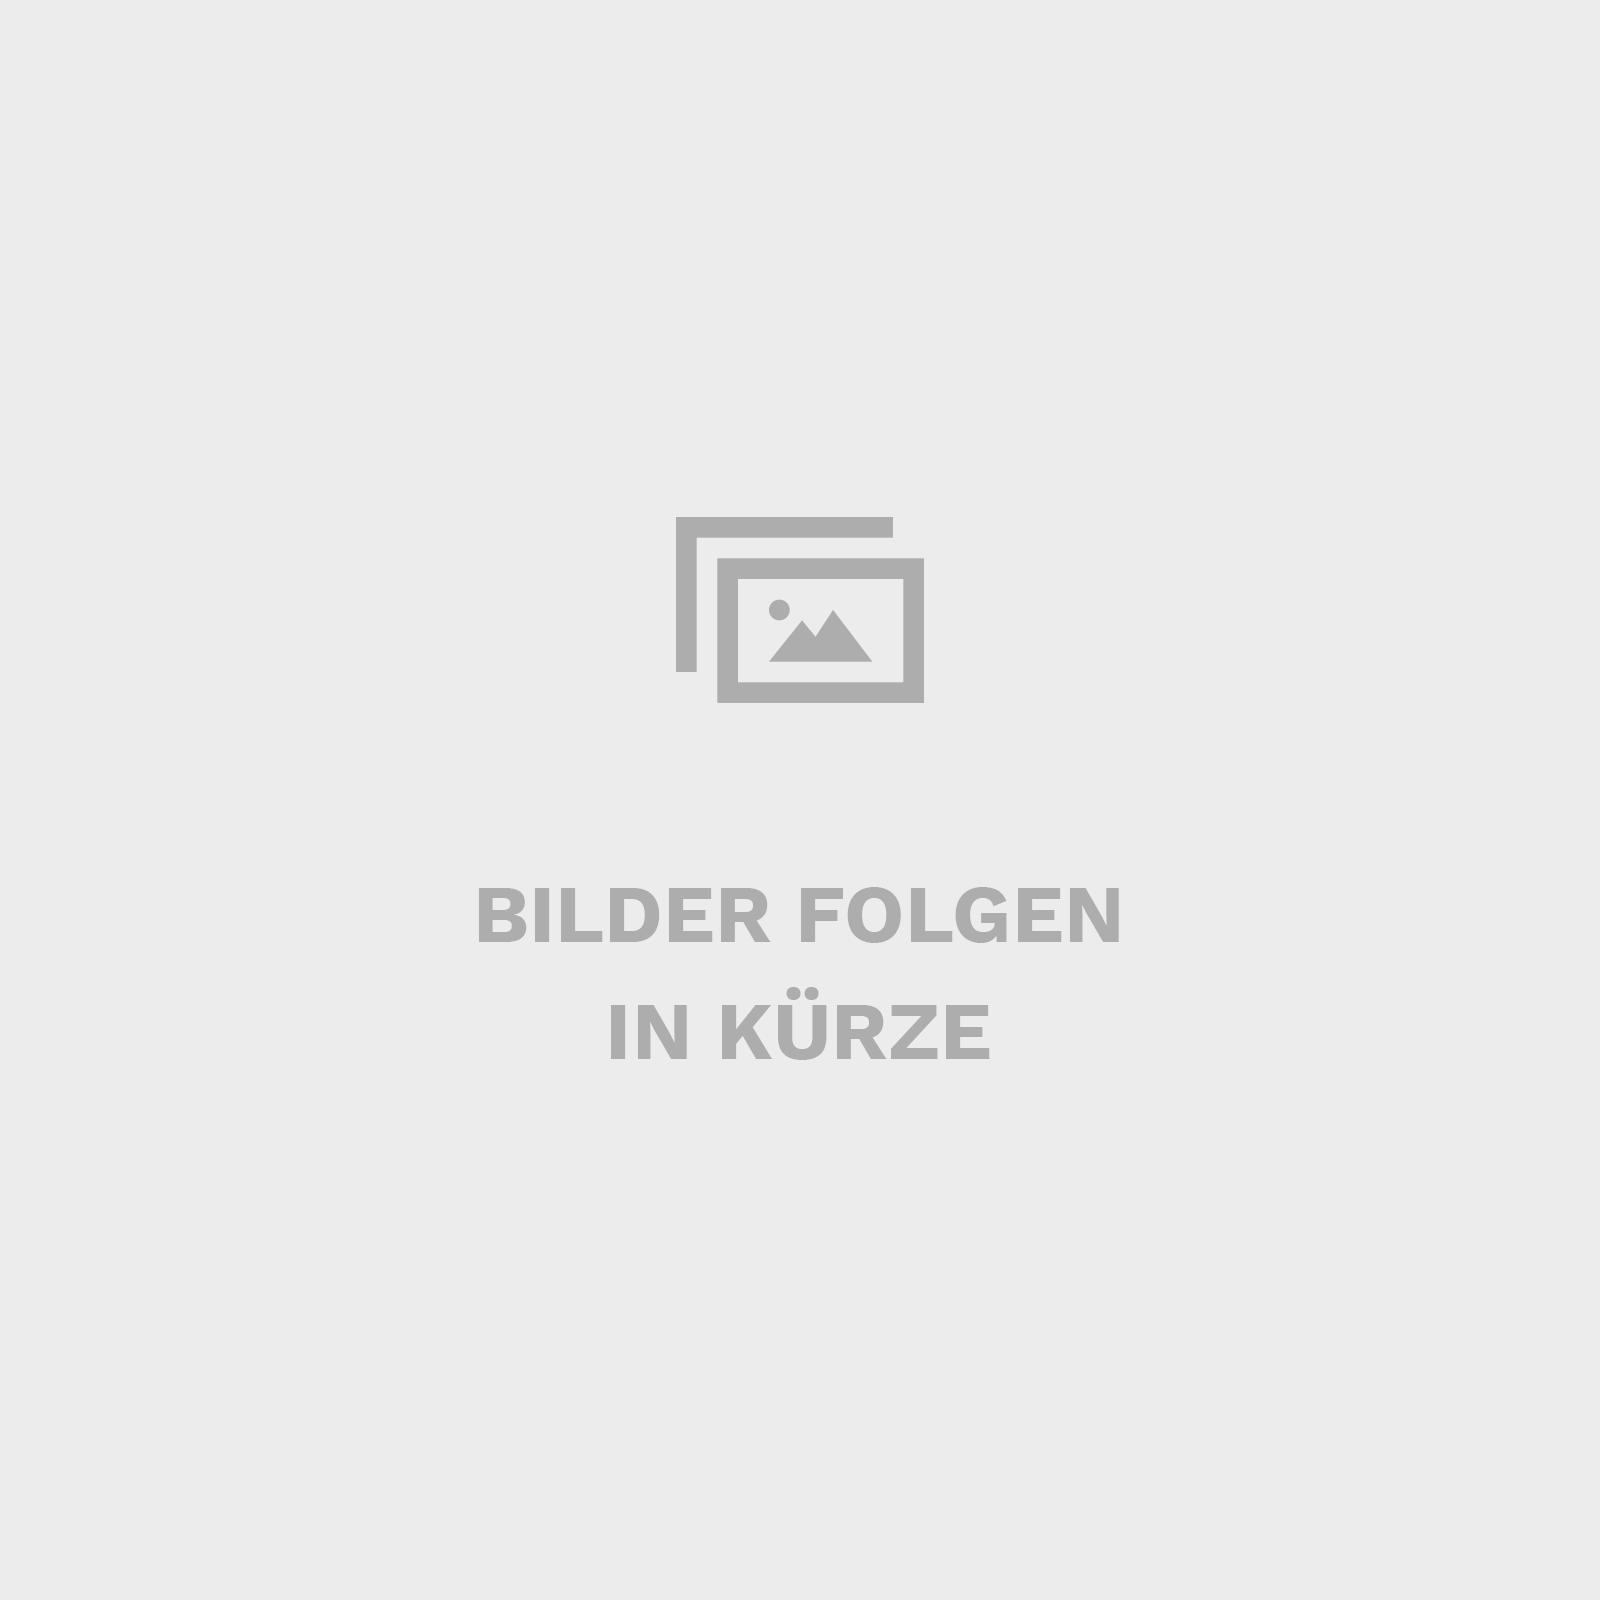 96 Molecules - Tall Floor Lamp - Schirm - Herstellung